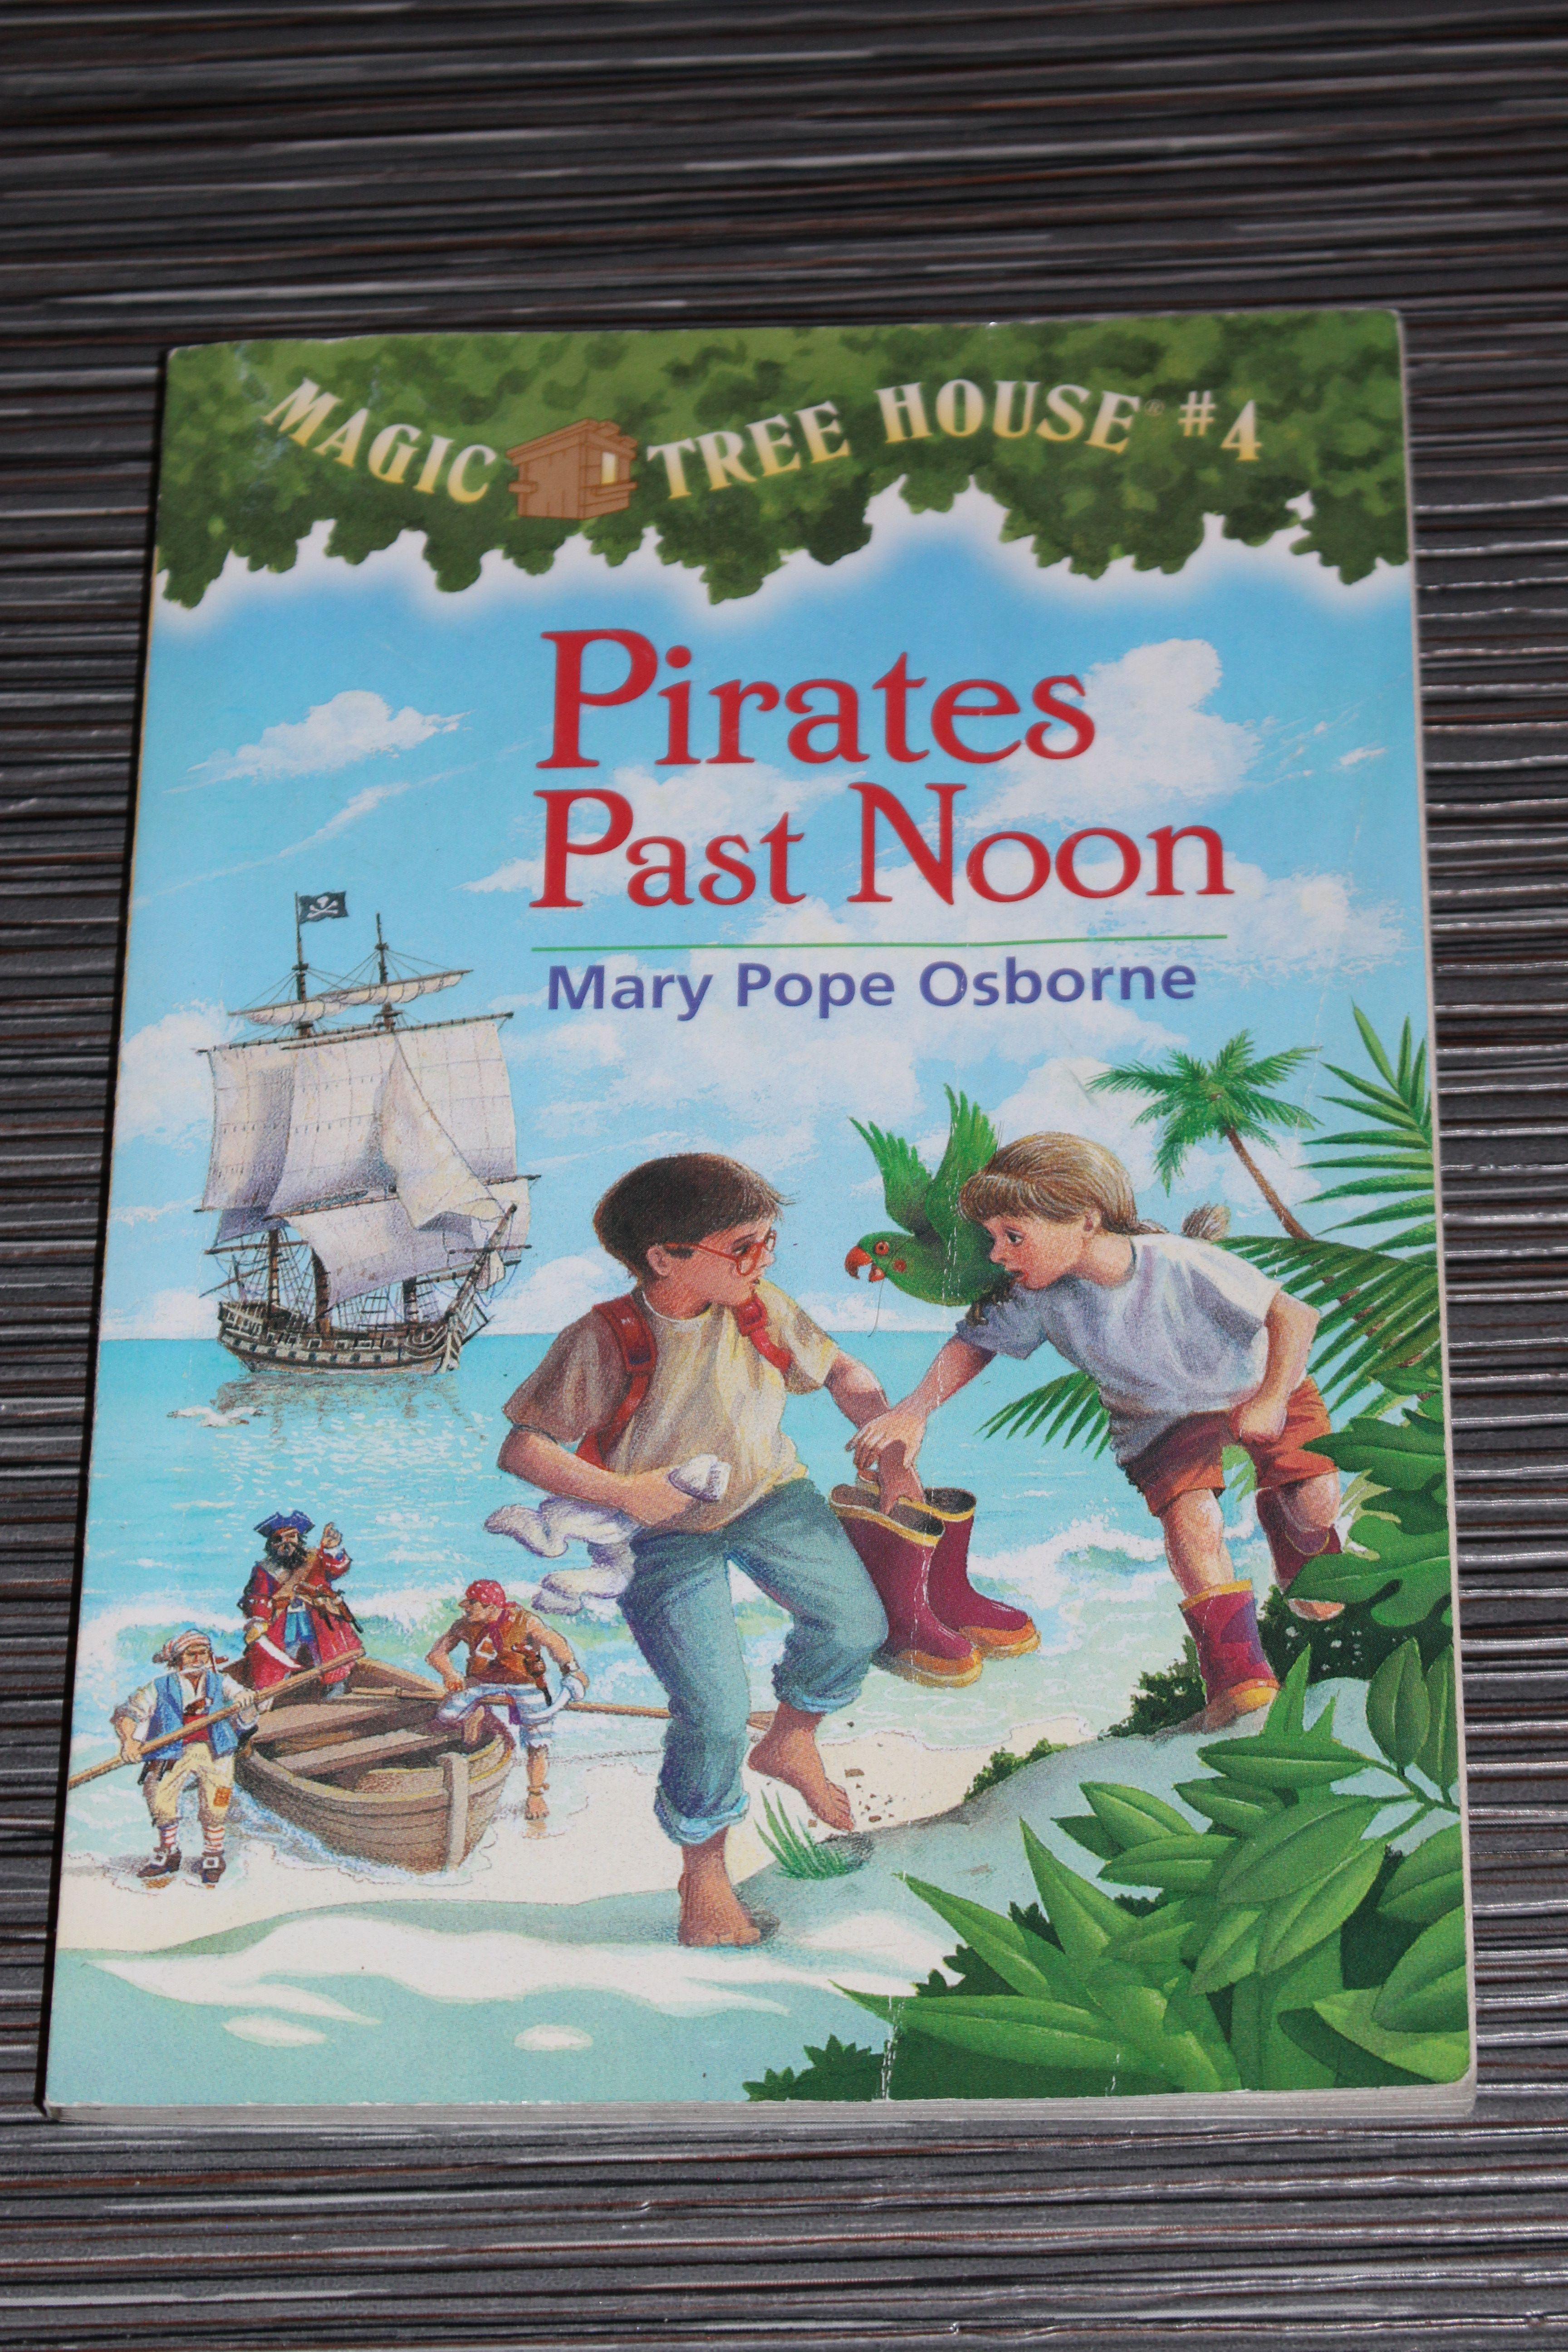 Magic Tree House Book 4 Pirates Past Noon